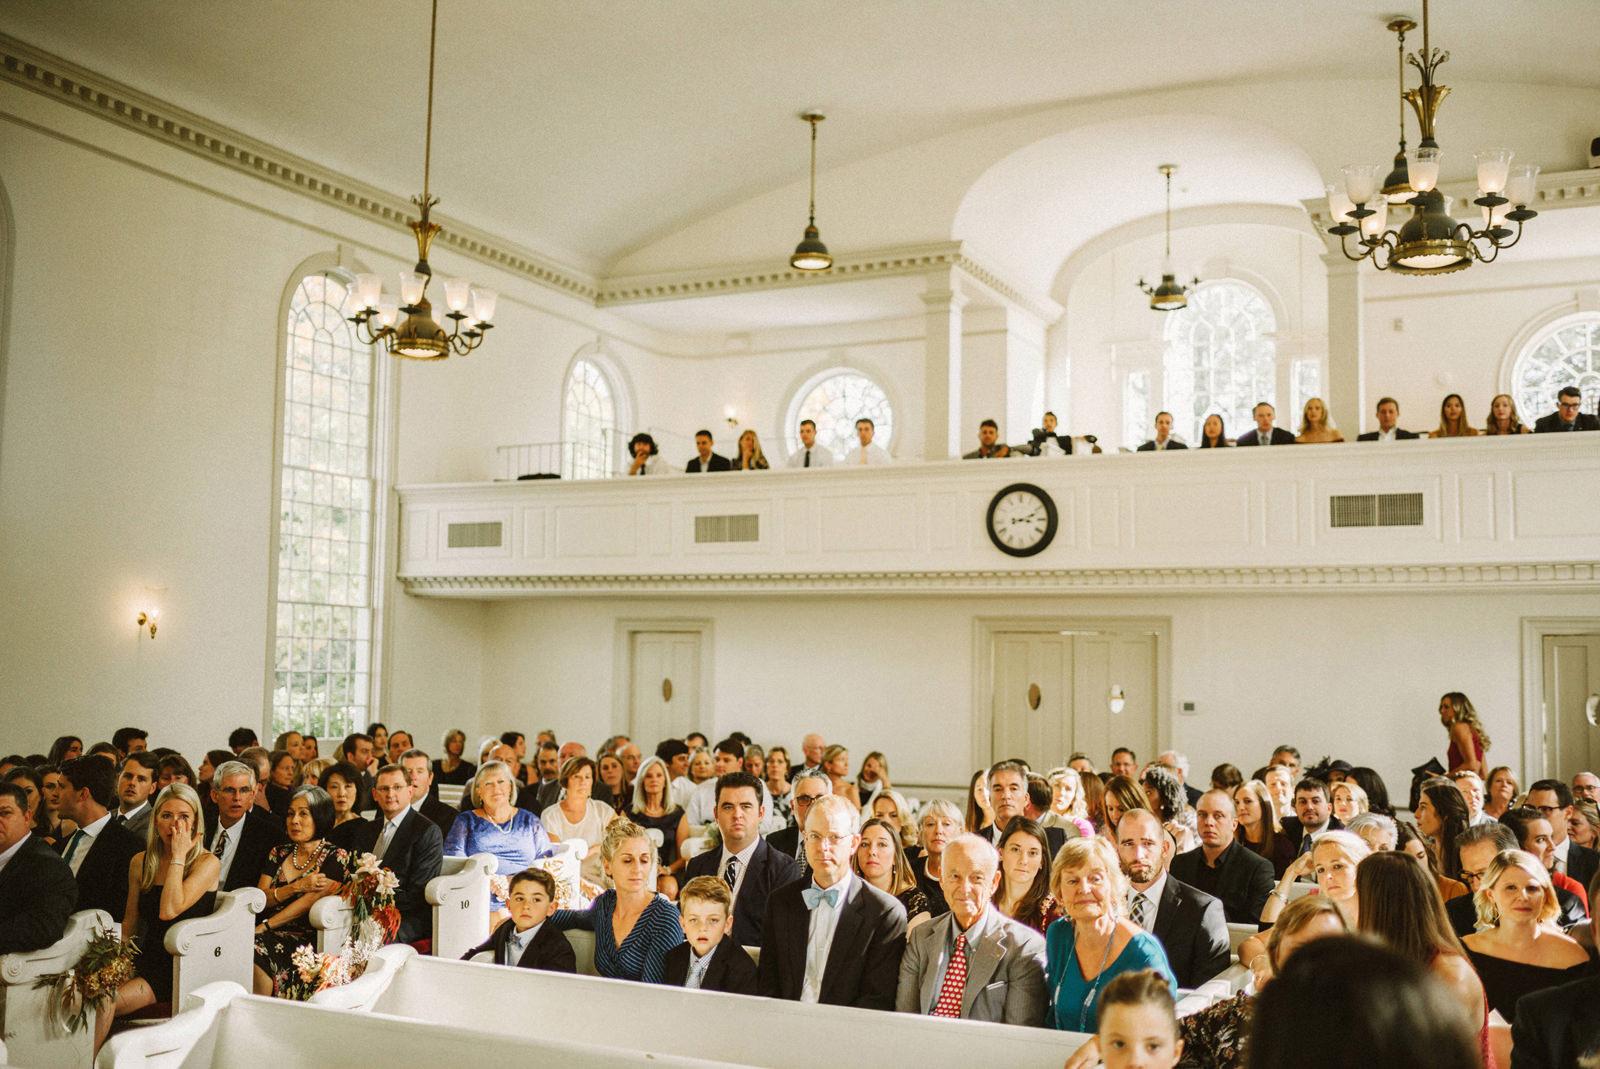 bridgeport-wedding-038 BRIDGEPORT, CONNECTICUT BACKYARD WEDDING